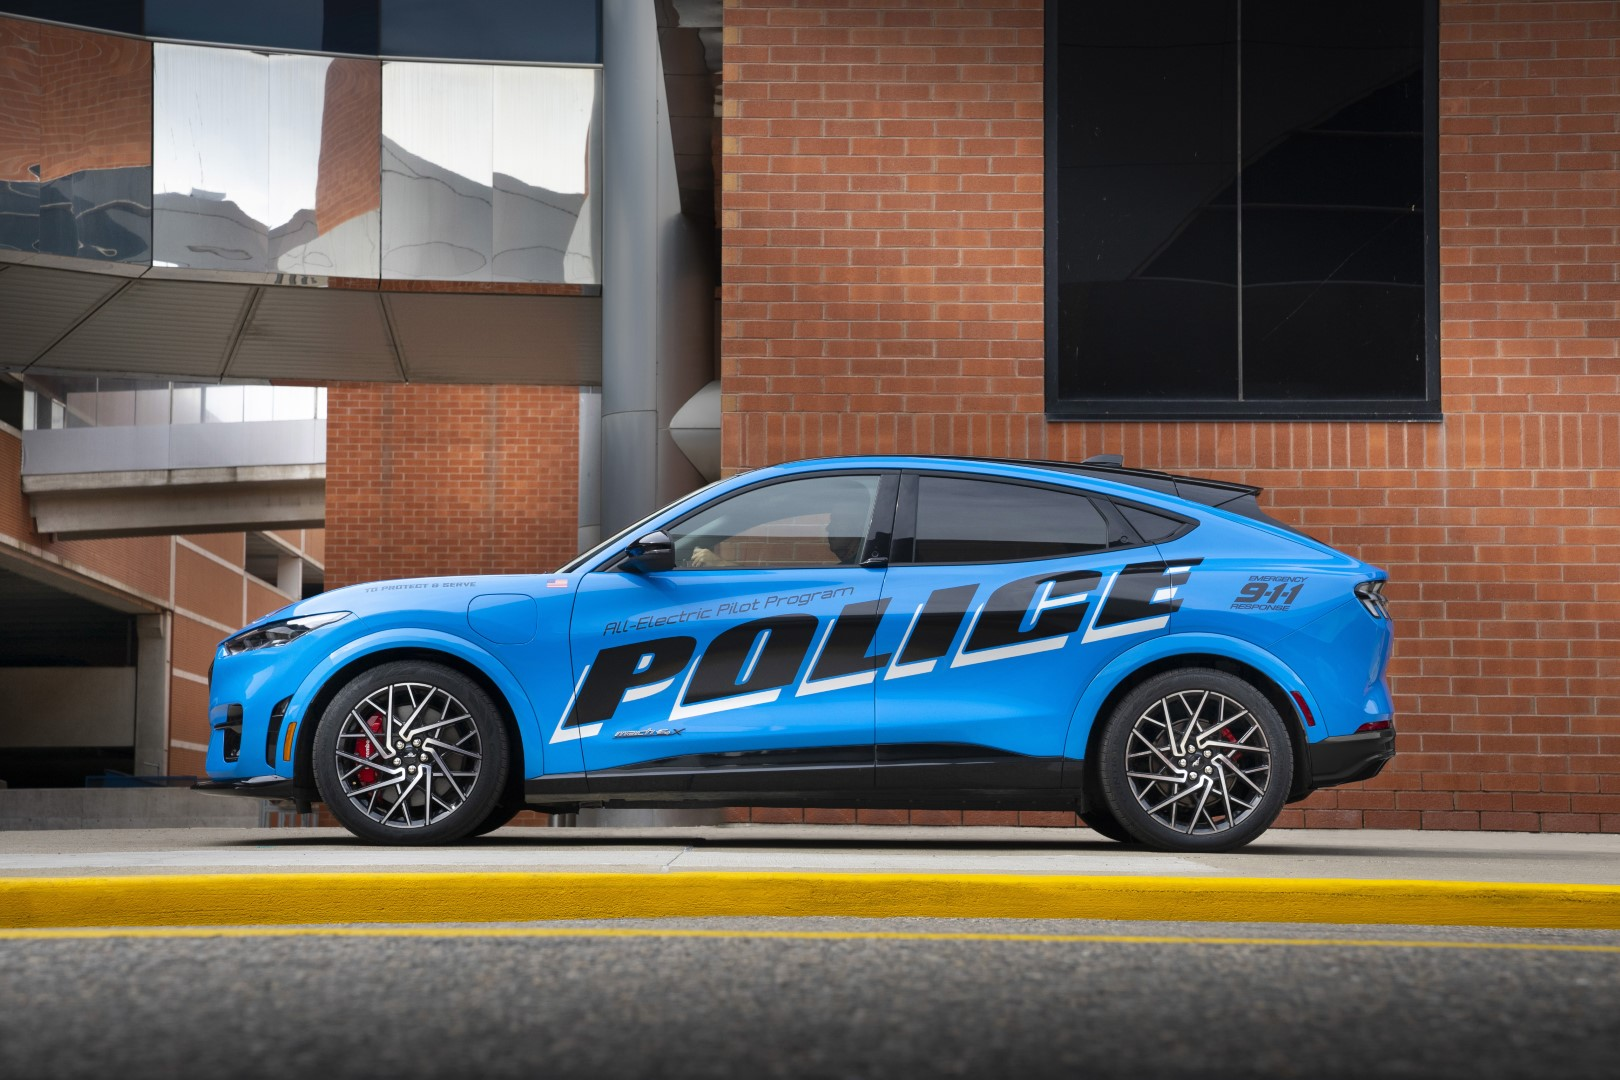 Mustang Mach-E Police